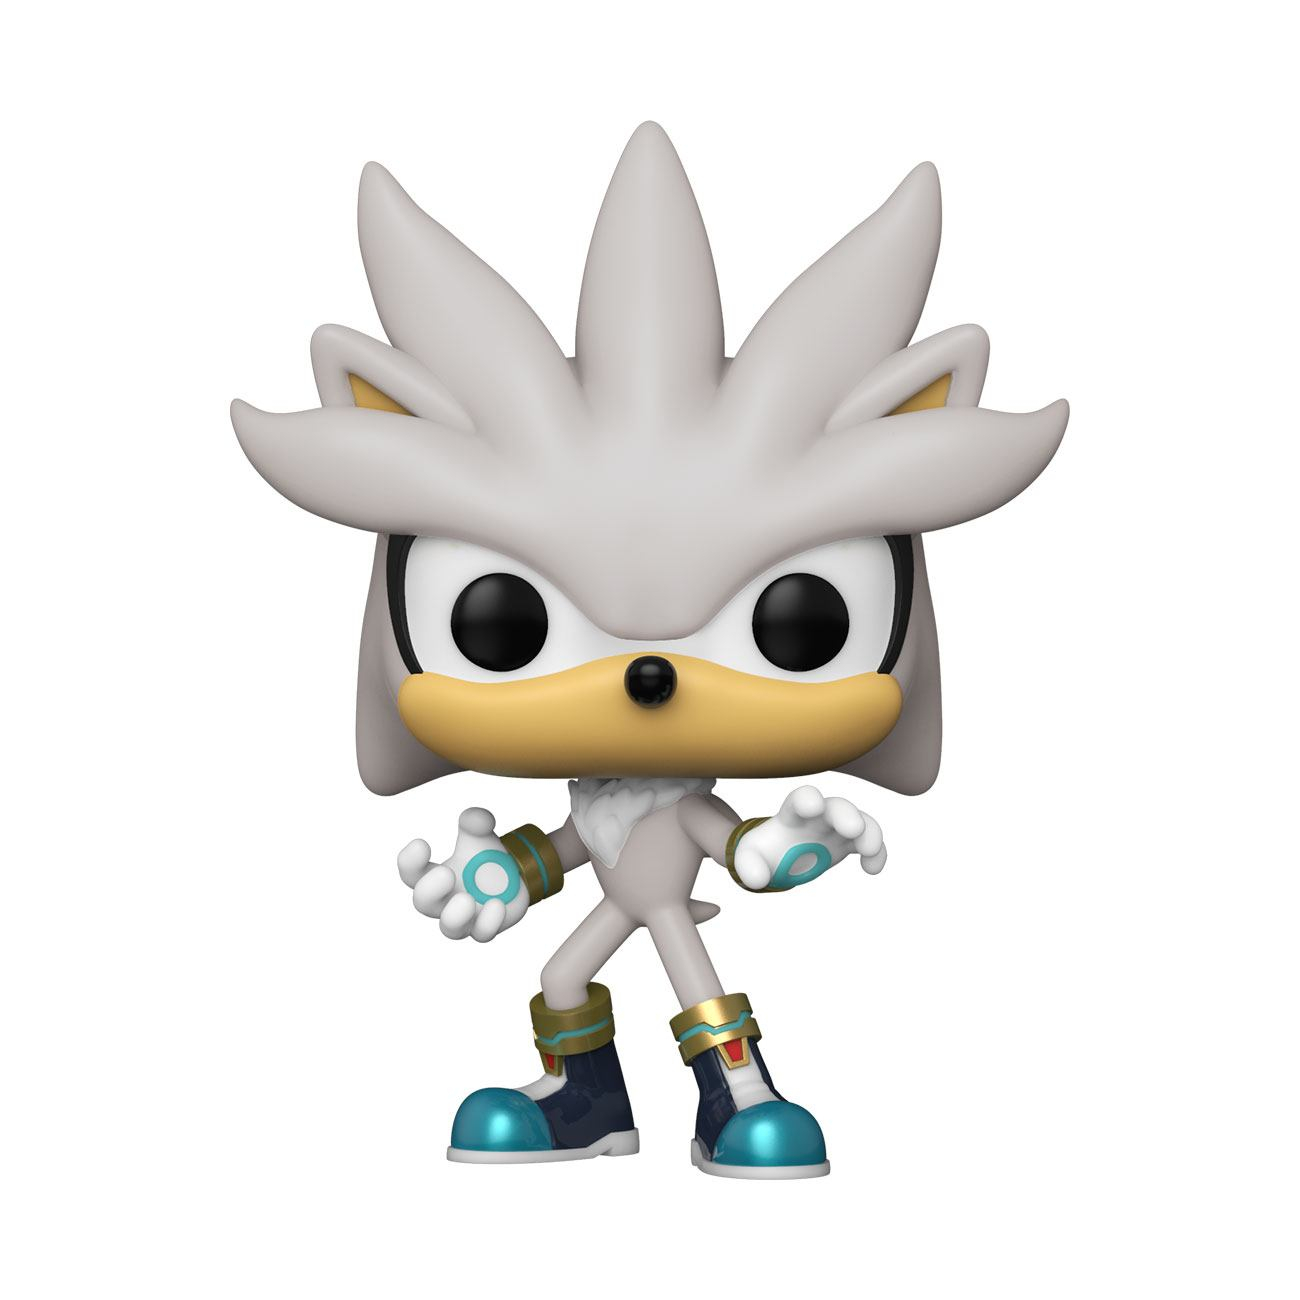 *PREORDER* Sonic the Hedgehog POP! Vinyl Figure: SILVER THE HEDGEHOG - SONIC 30th by Funko